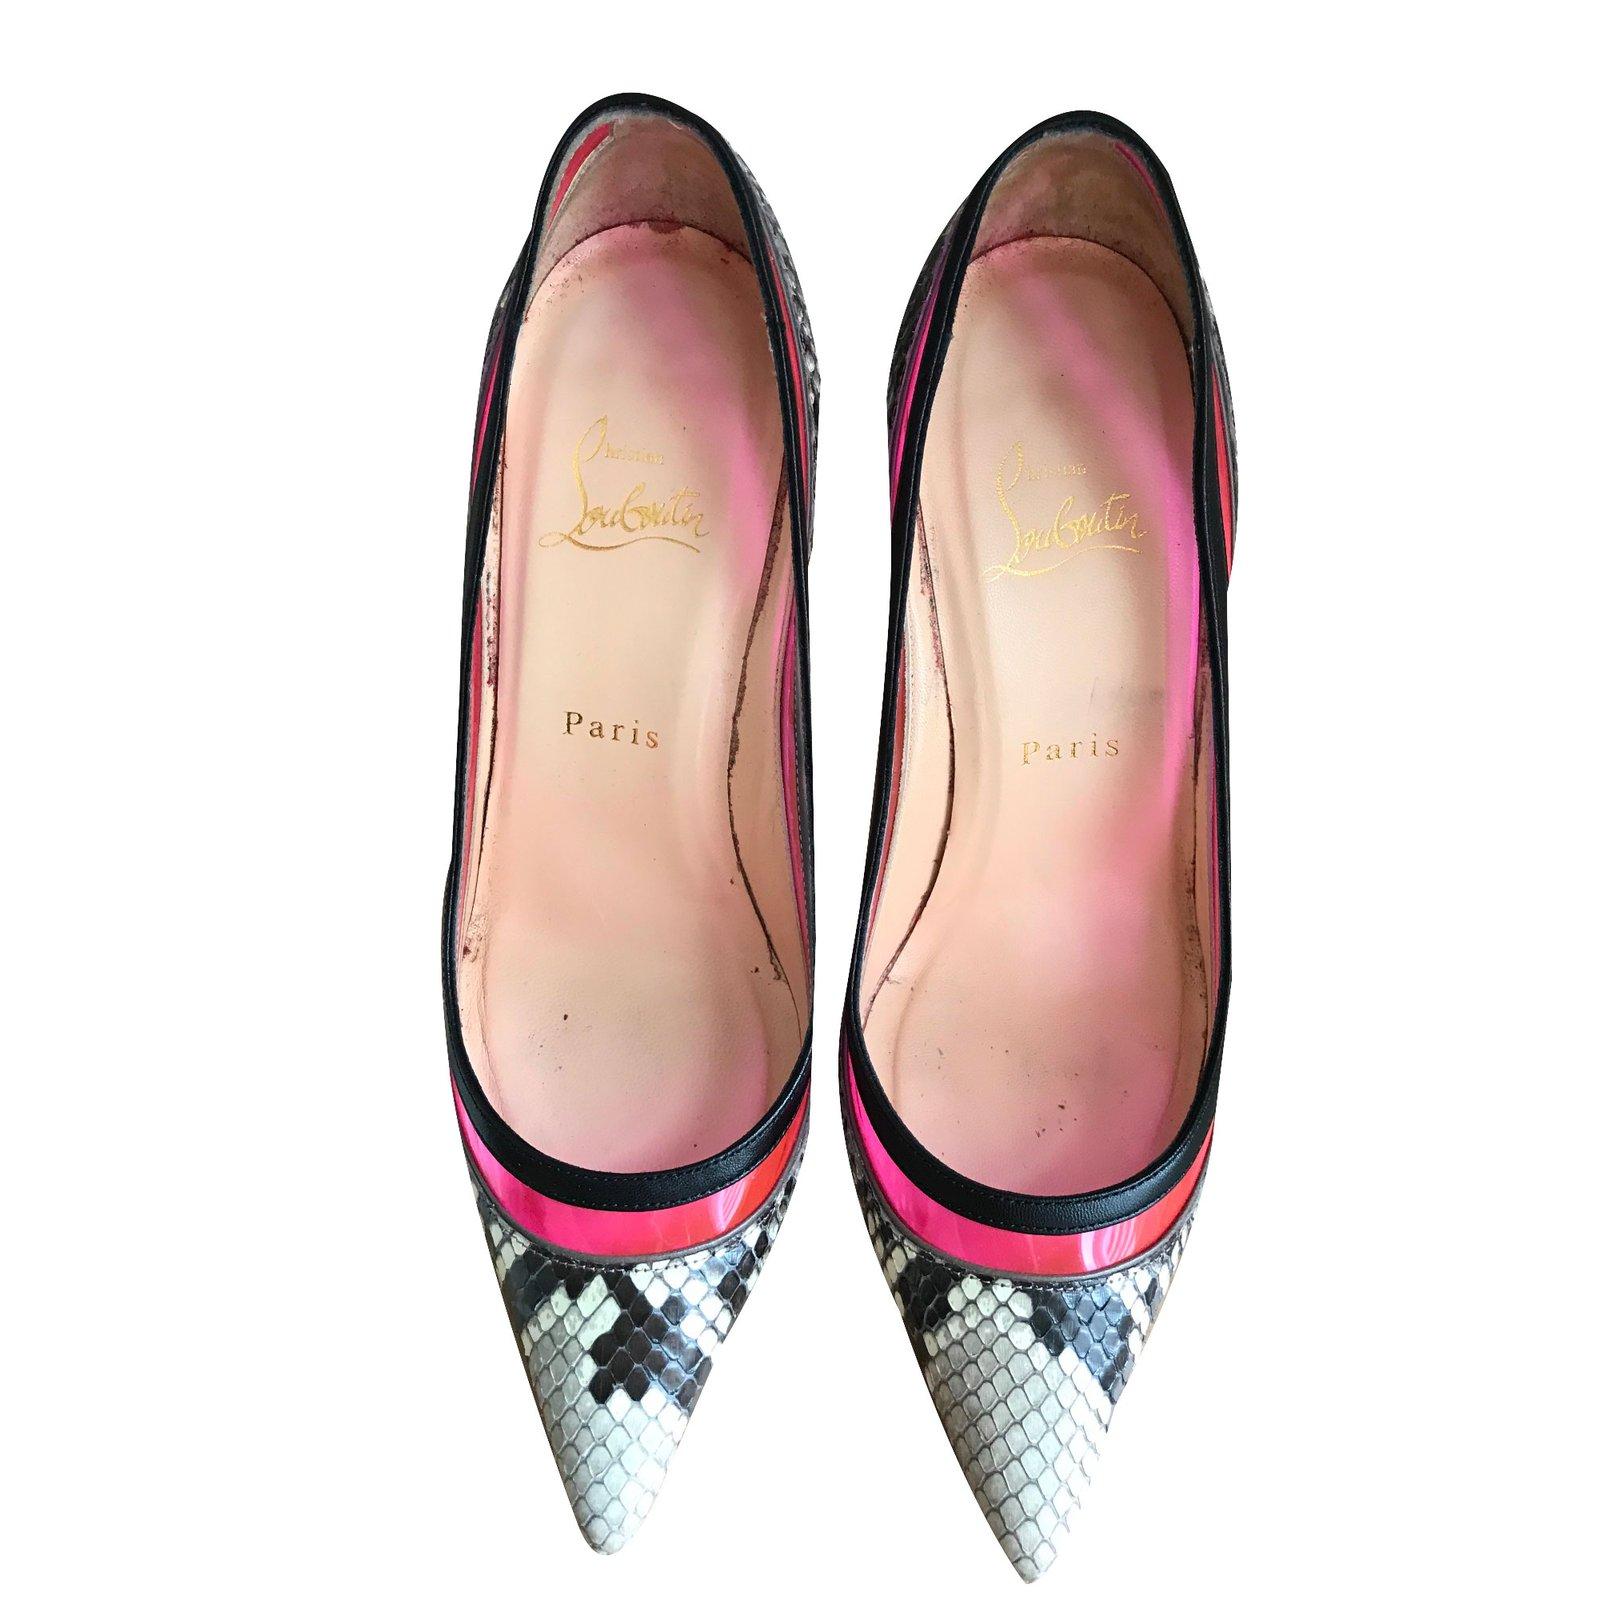 302197edfa2e ... wholesale christian louboutin pumps heels python python print ref.70829  a0505 a0635